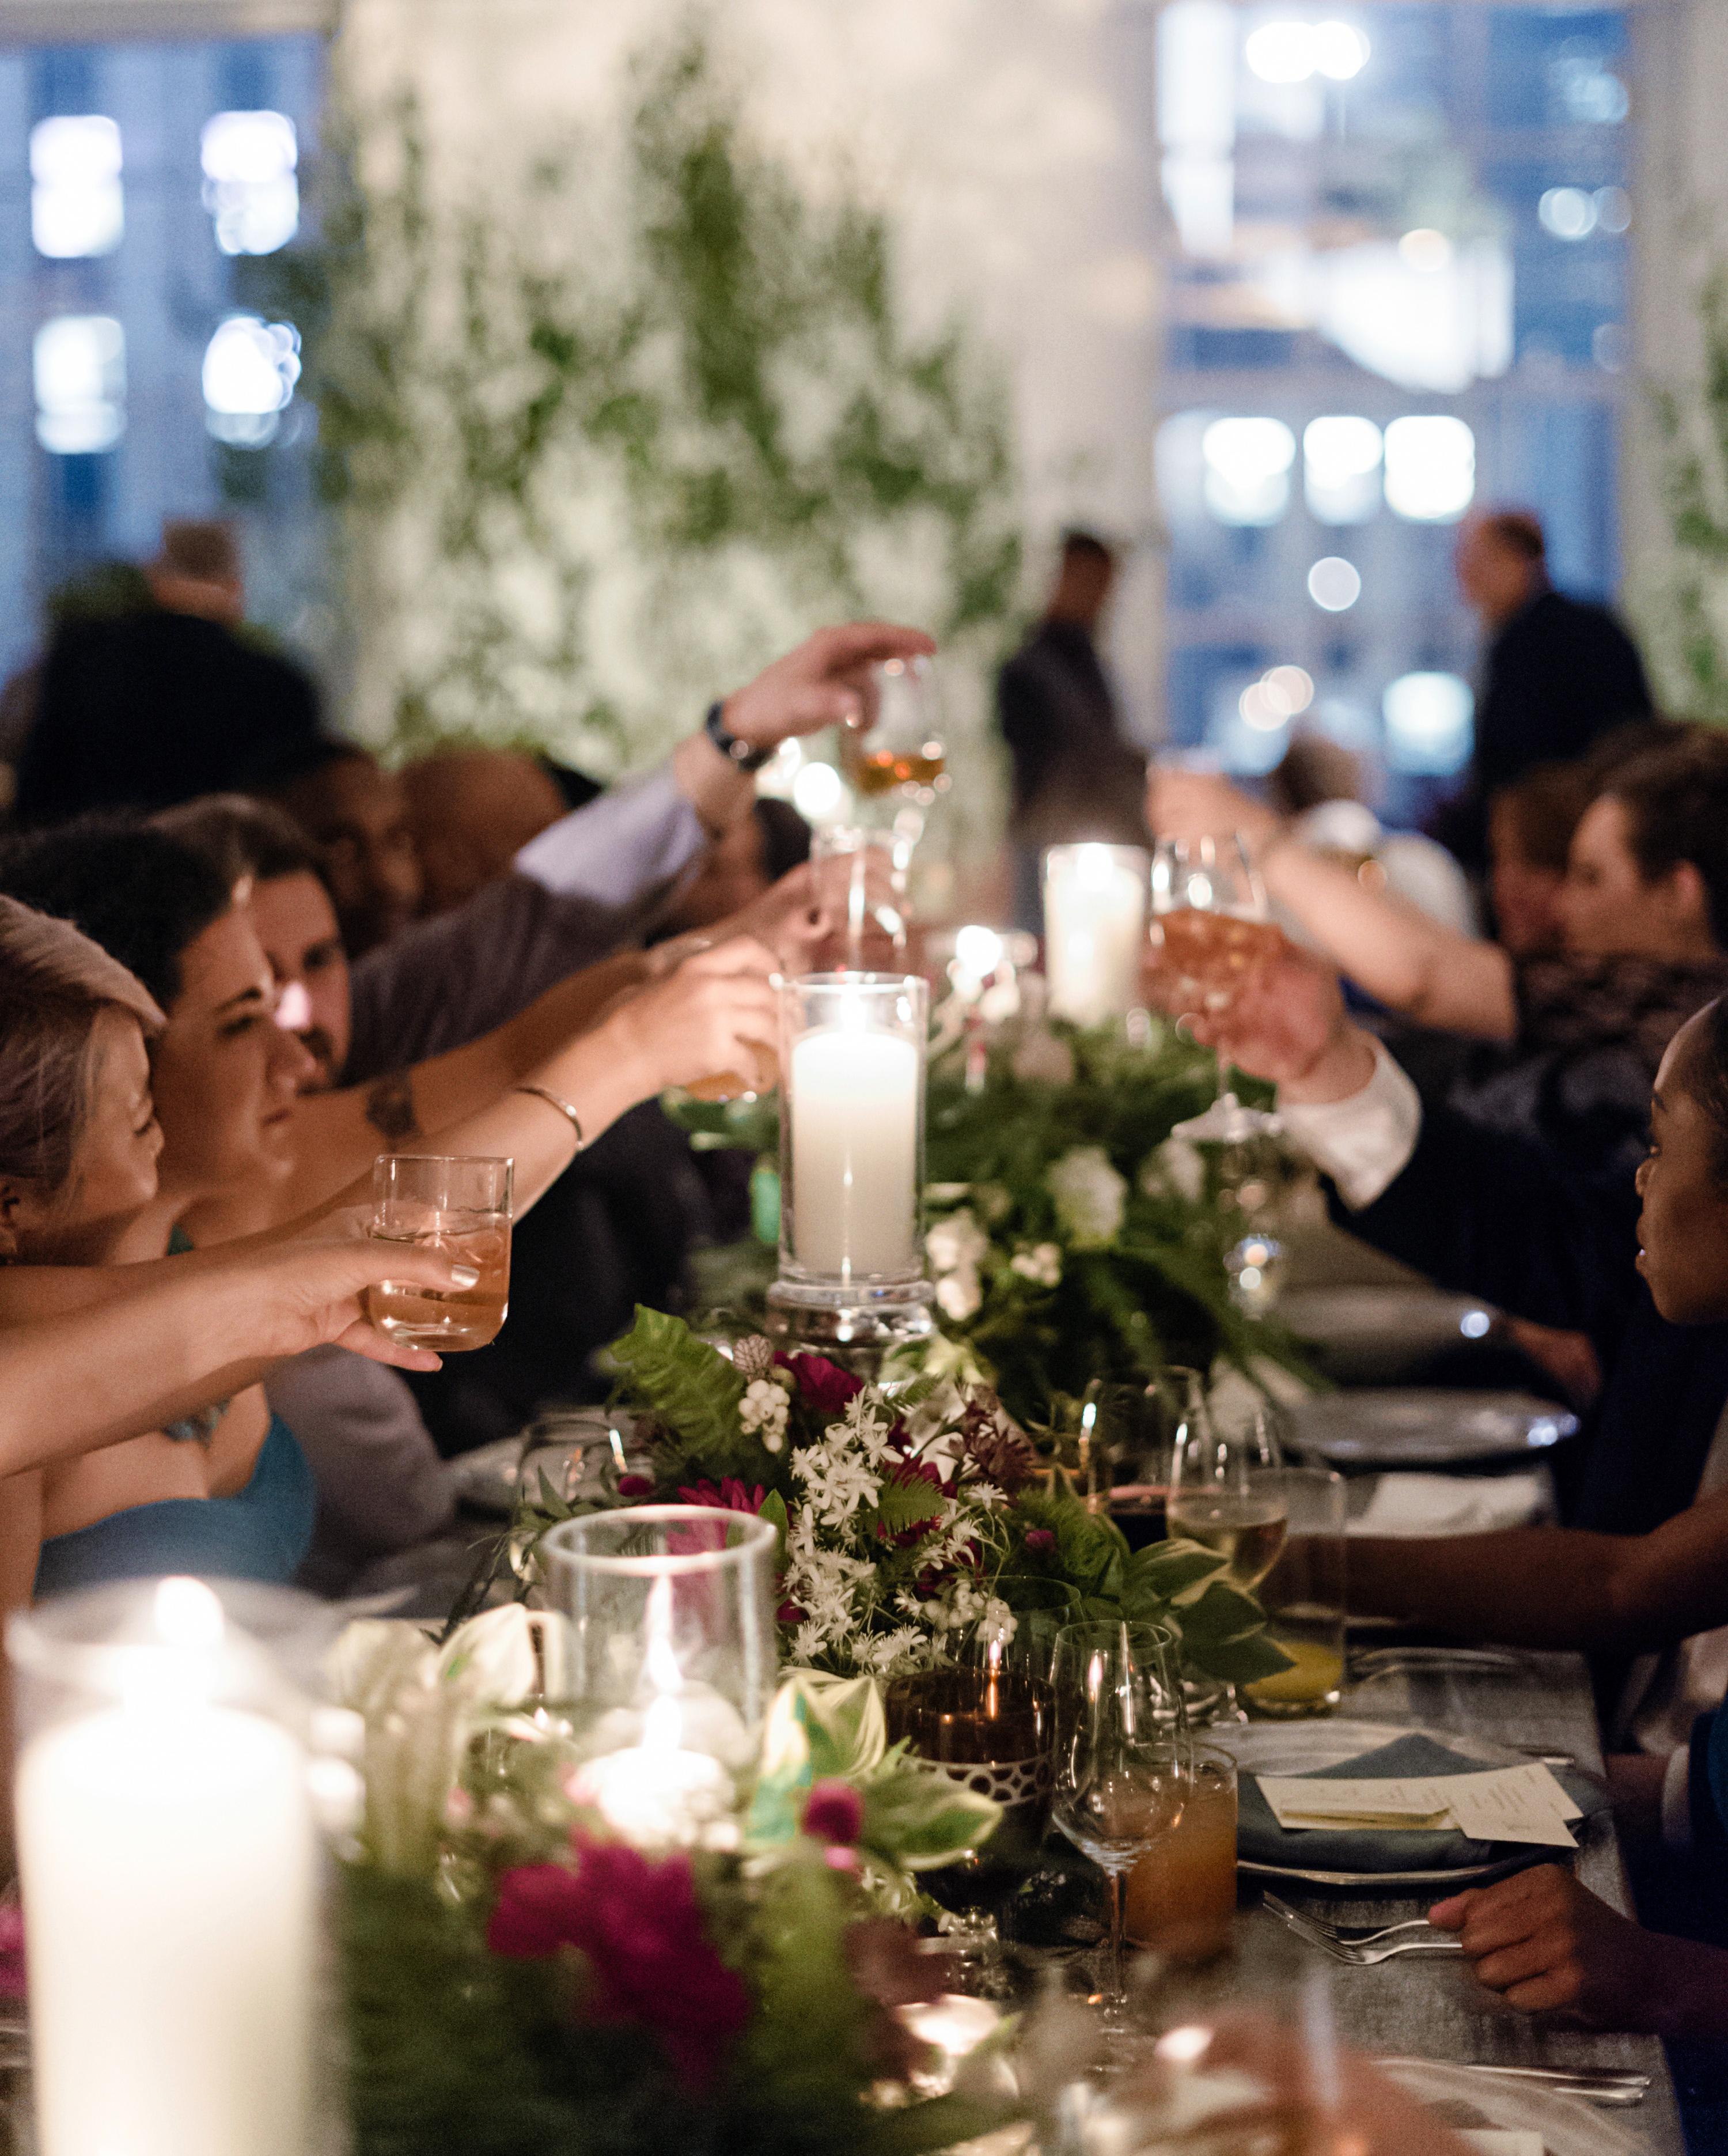 lilly-sean-wedding-toast-00576-s112089-0815.jpg